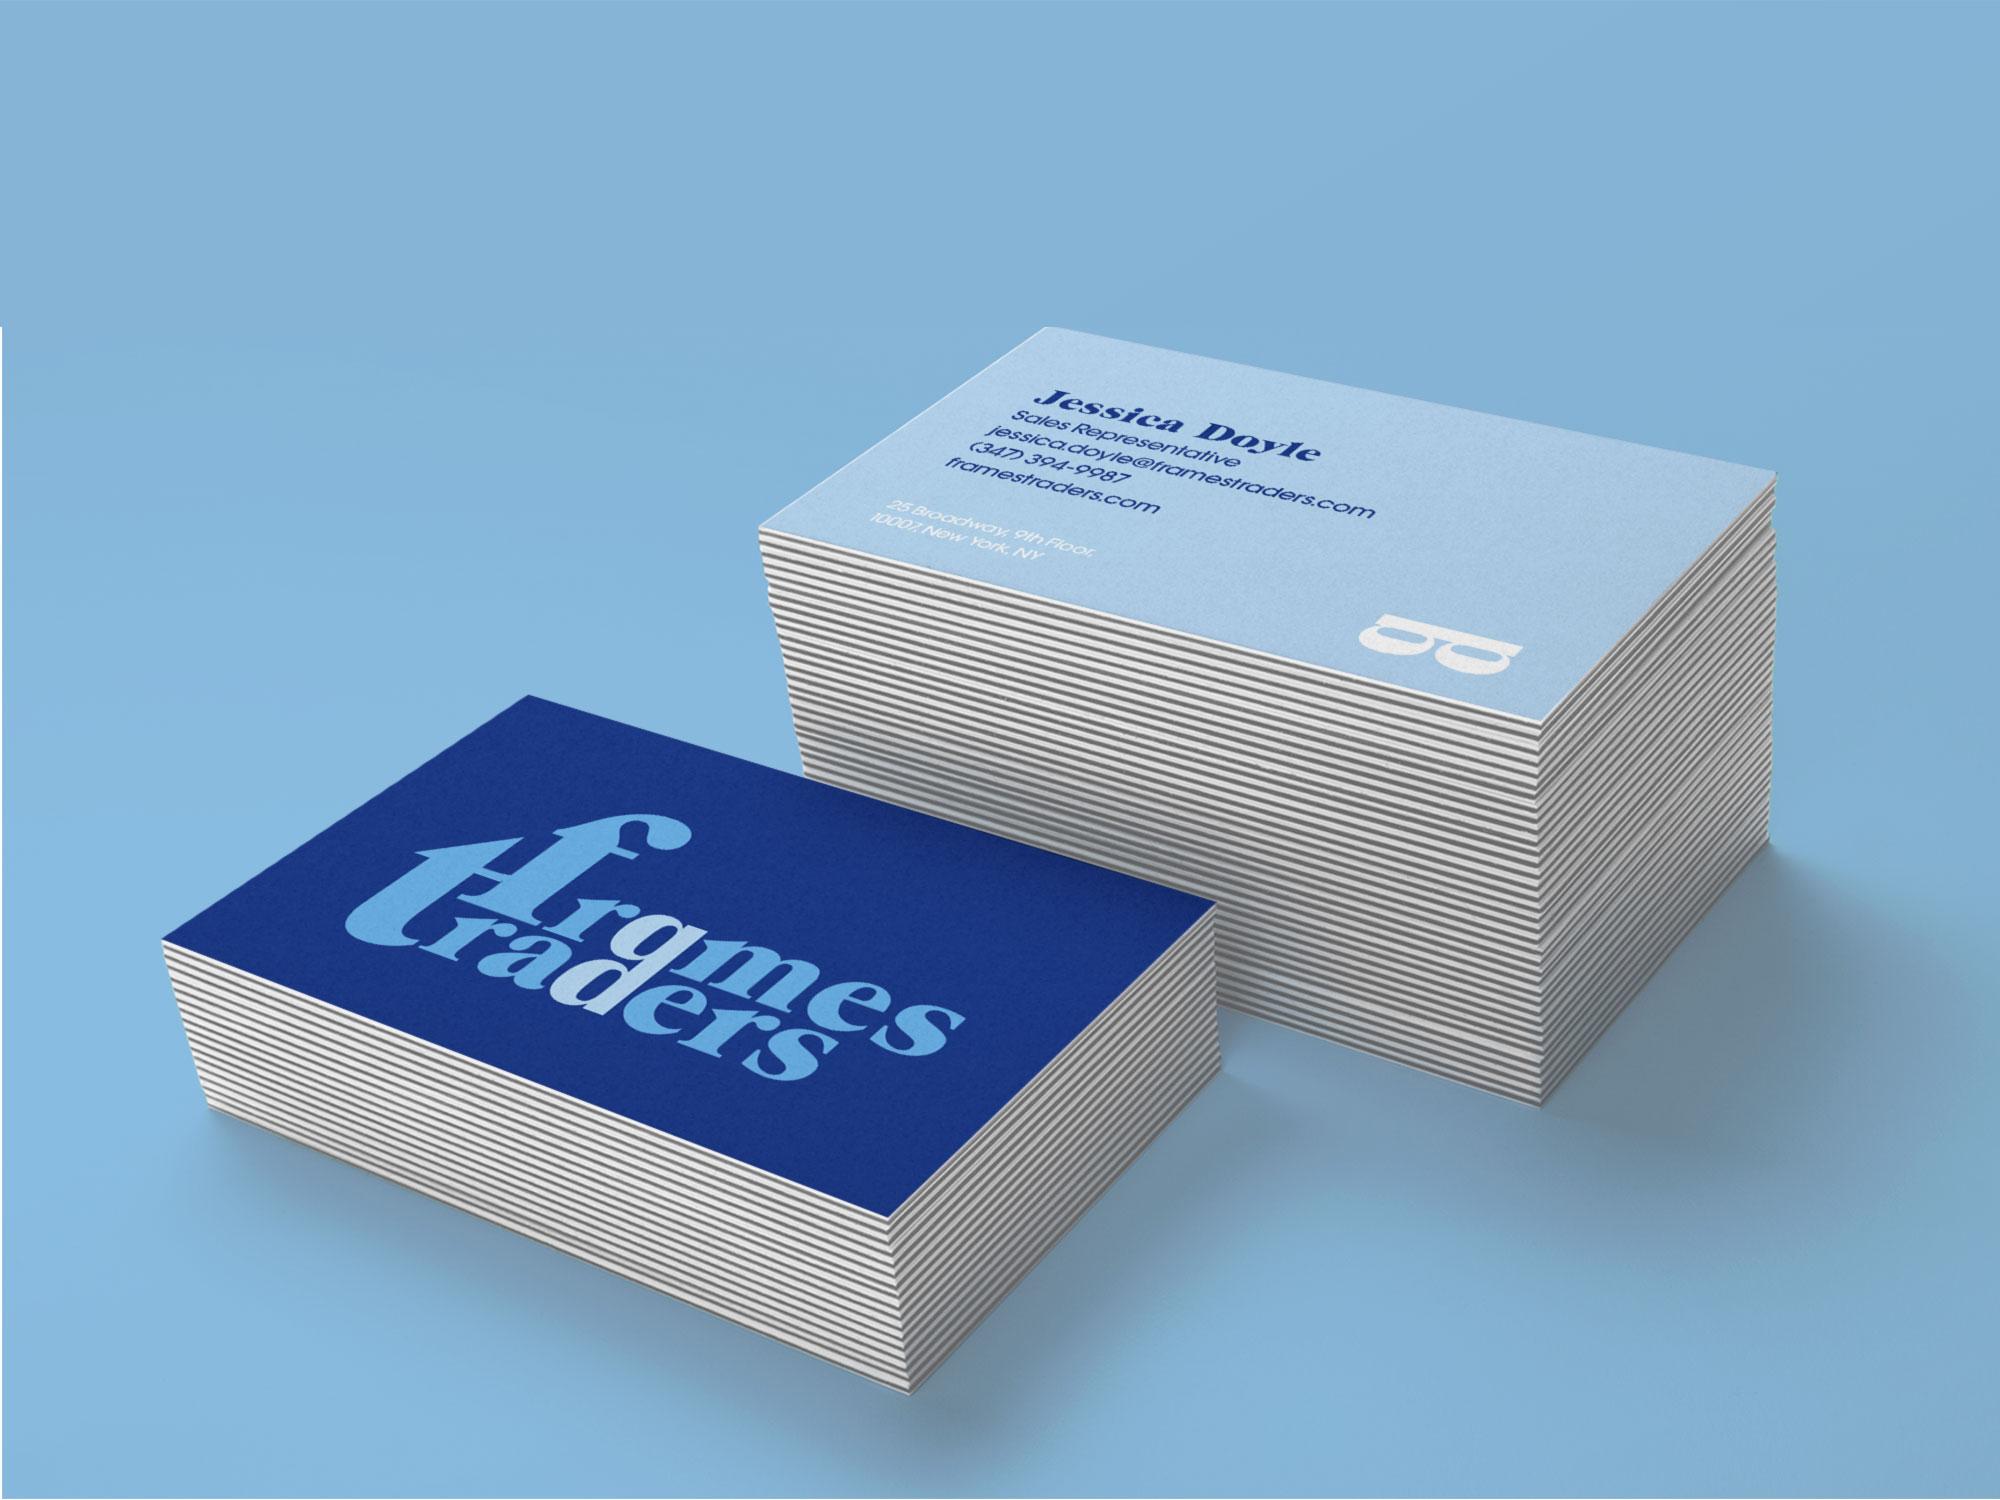 Business_Cards_2000x1500.jpg